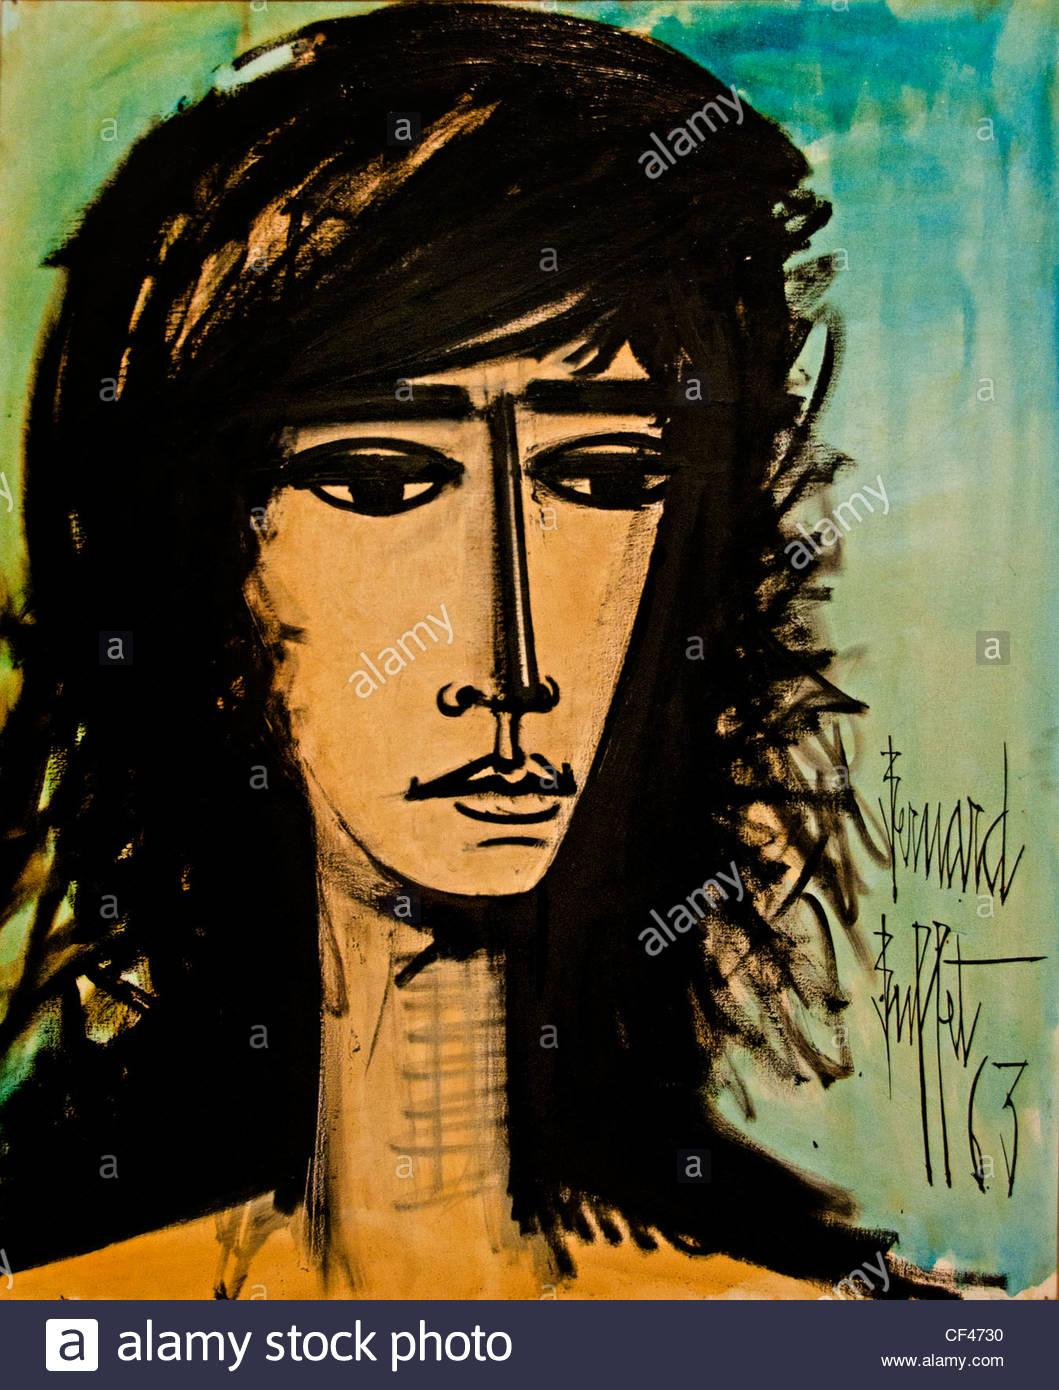 Francoise Hardy 1963 Bernard Buffet Maler 1928-1999 Frankreich französische Sängerin Schauspielerin und Stockbild